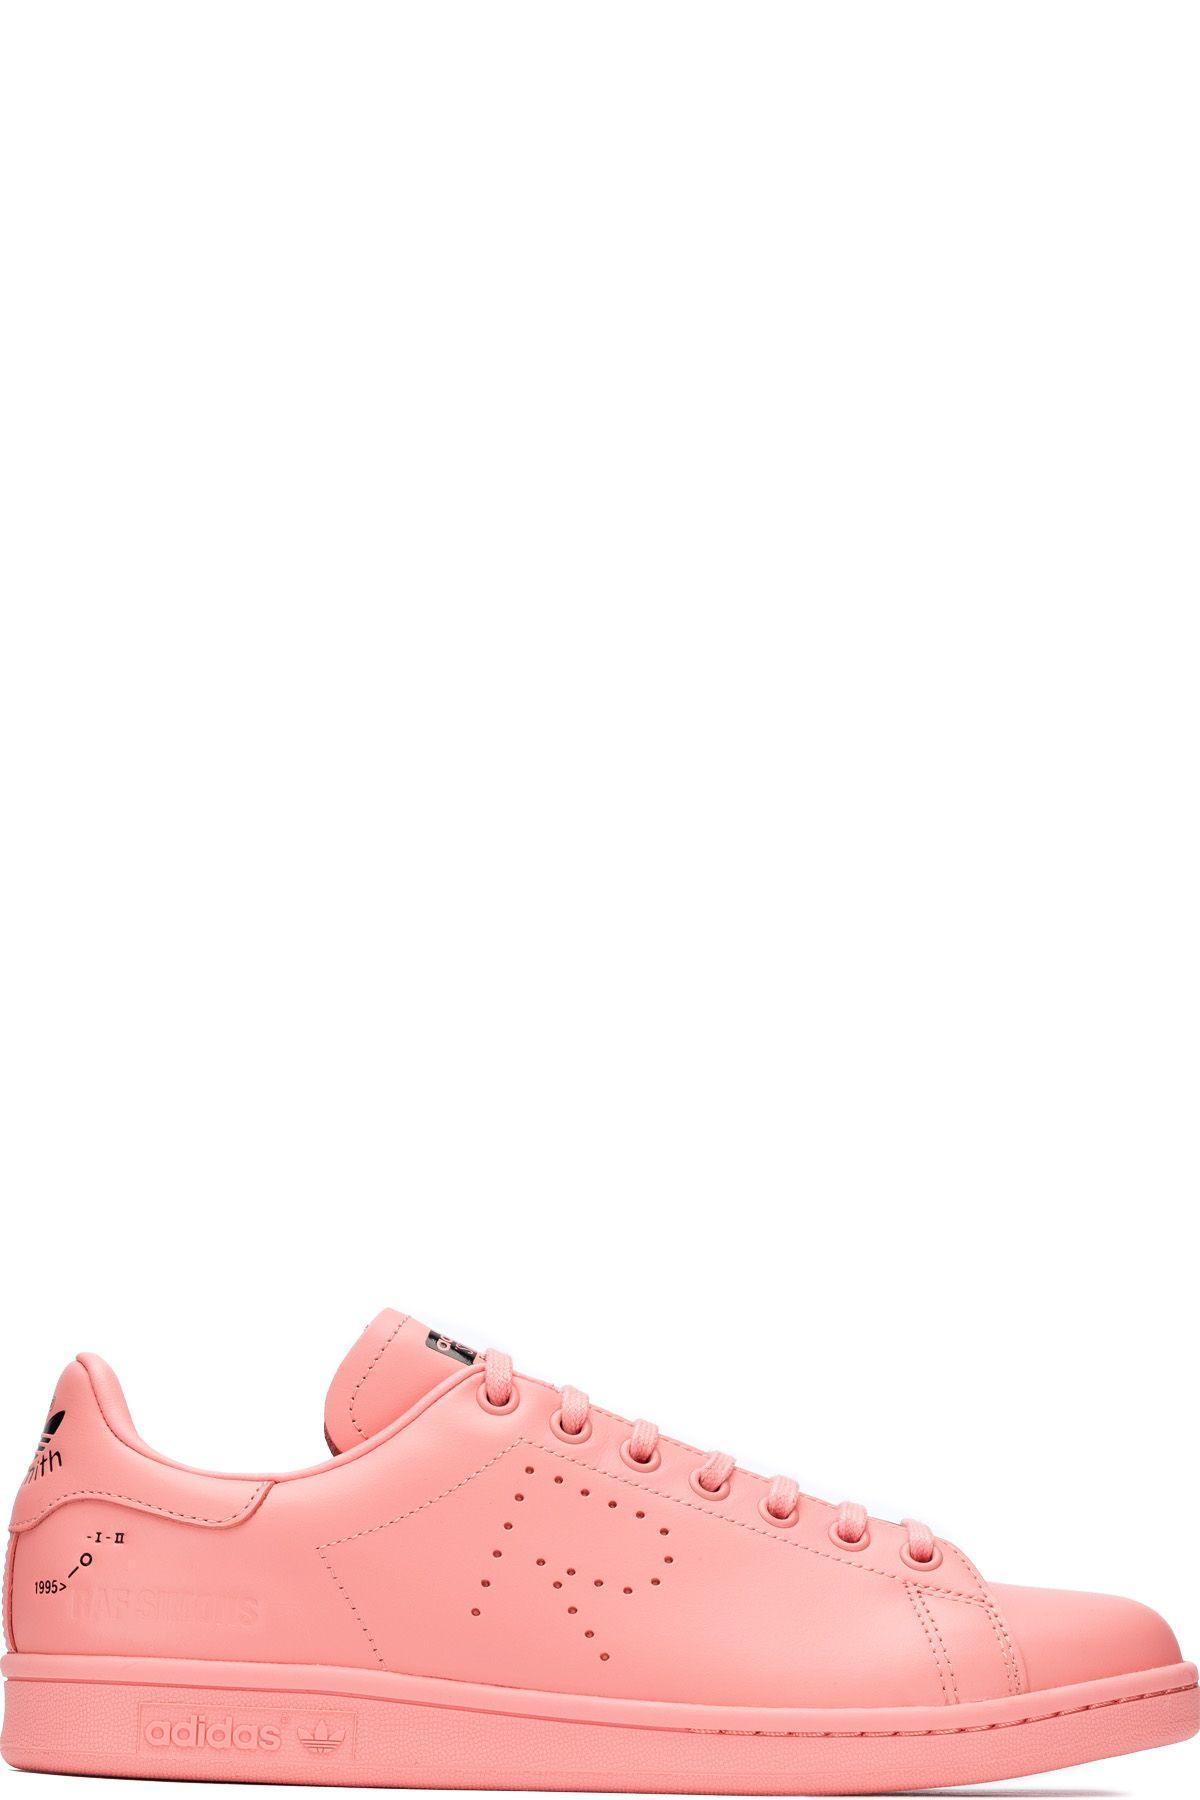 adidas stan smith raf simons rose